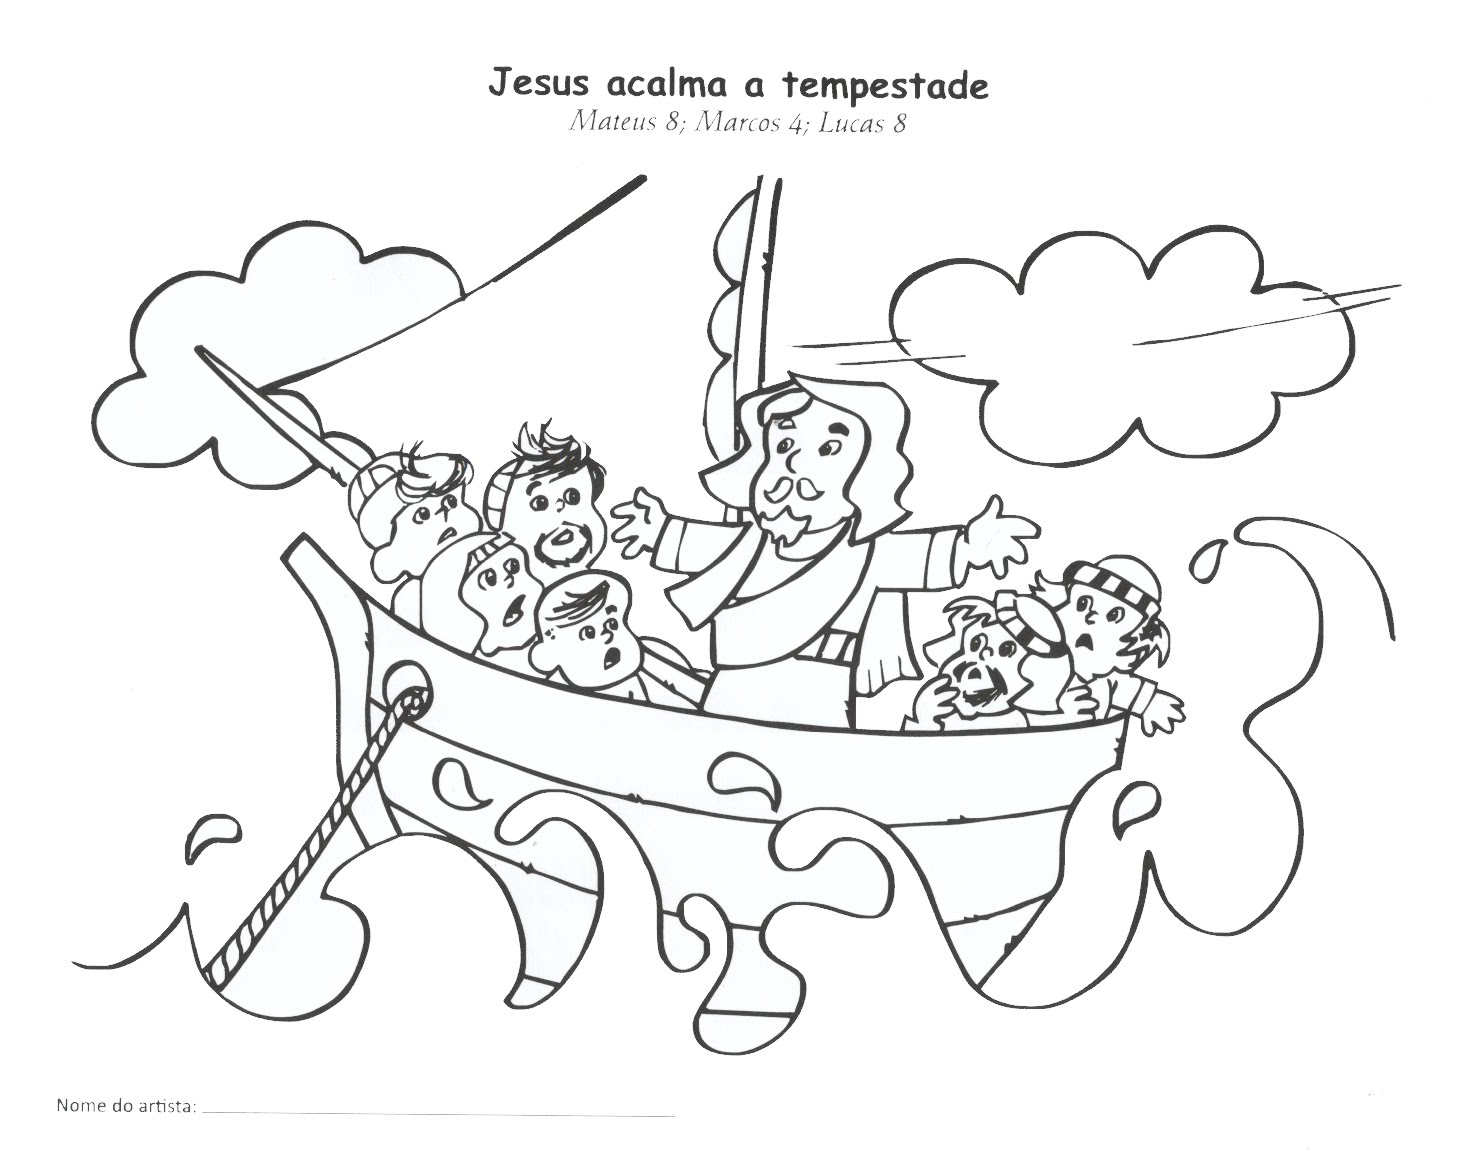 http://2.bp.blogspot.com/_GNPc3Bhs29o/TM9htmCm8VI/AAAAAAAAB8c/JcR0PfSVYjU/s1600/Jesus+acalma+a+tempestade.jpg